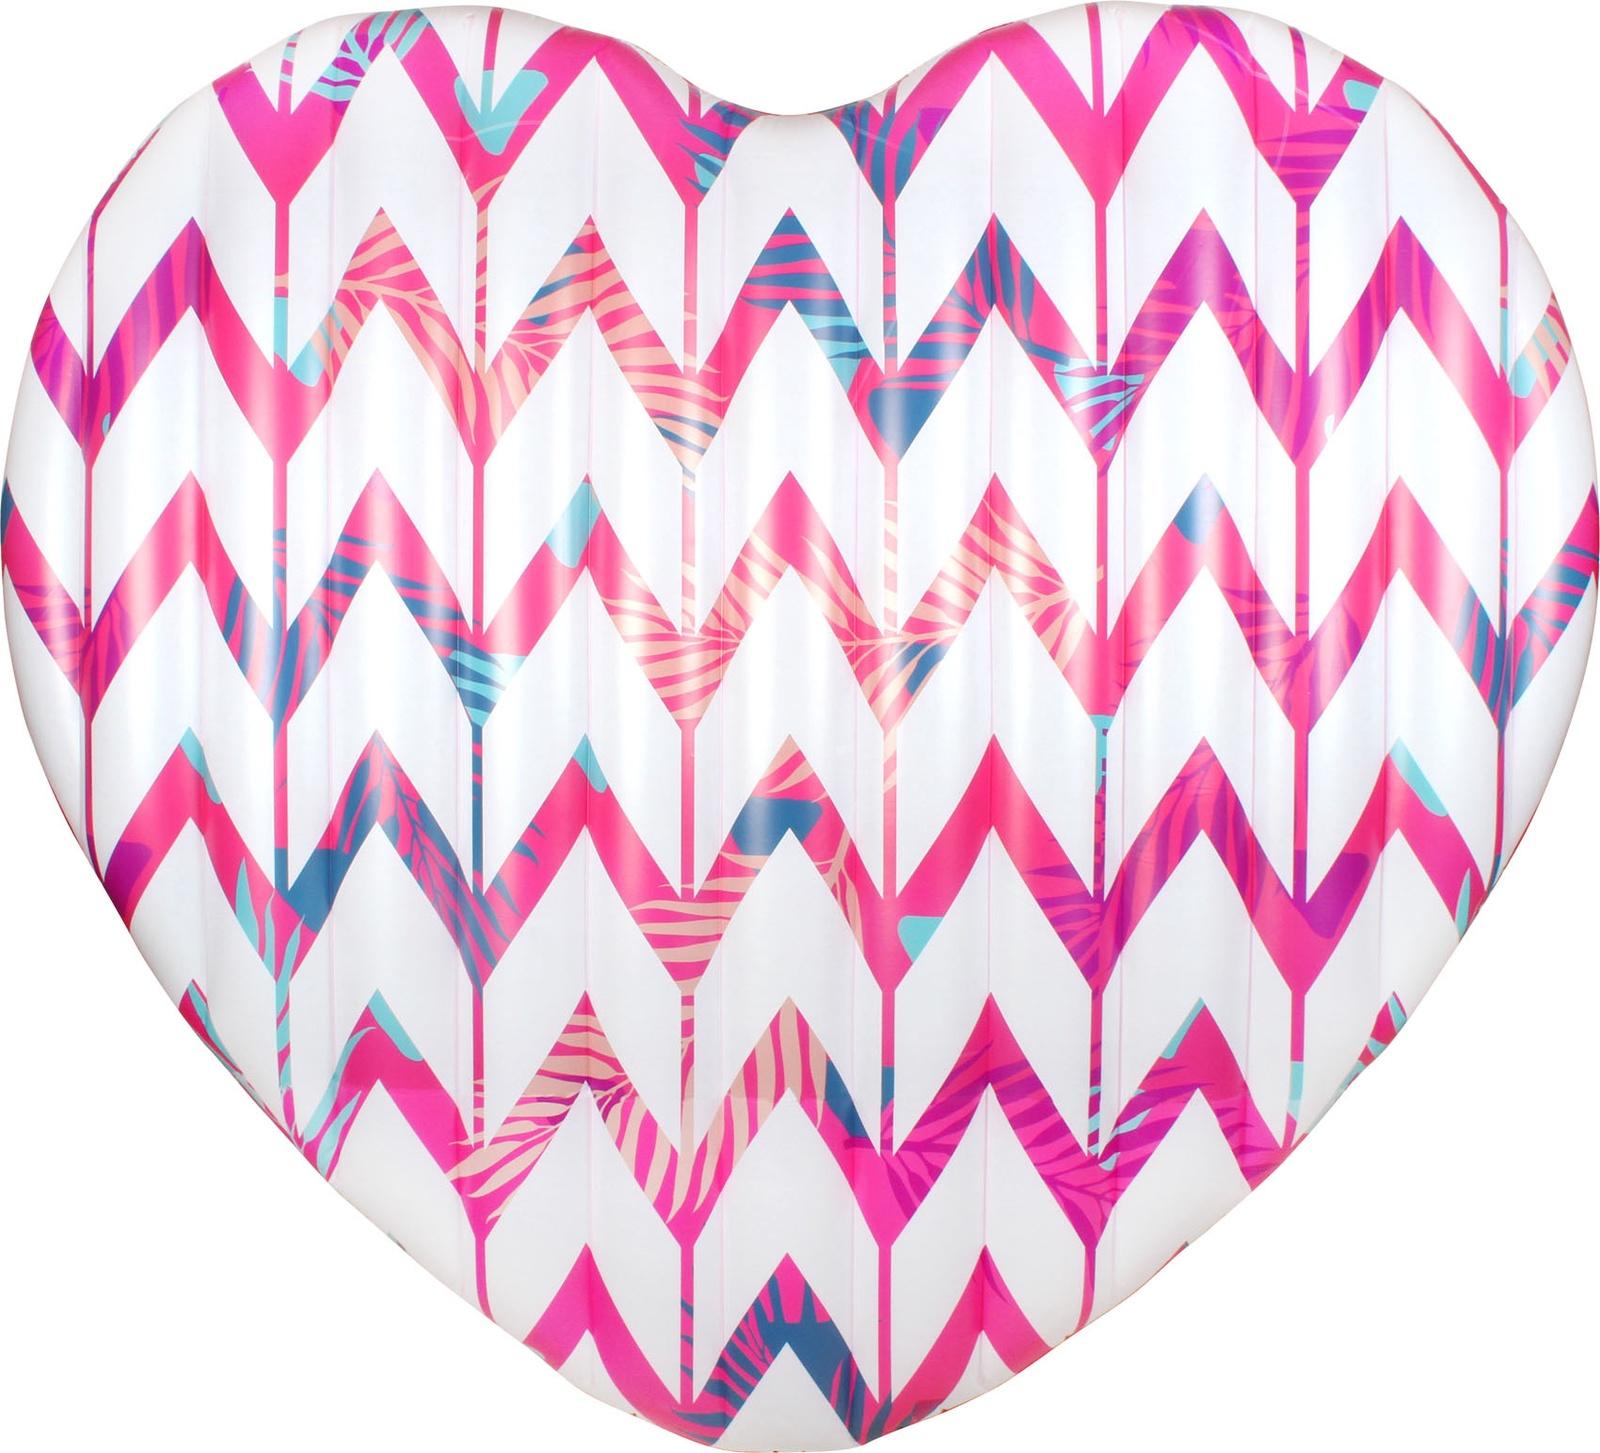 Матрас надувной Сердце 178 х 163 х 18 см